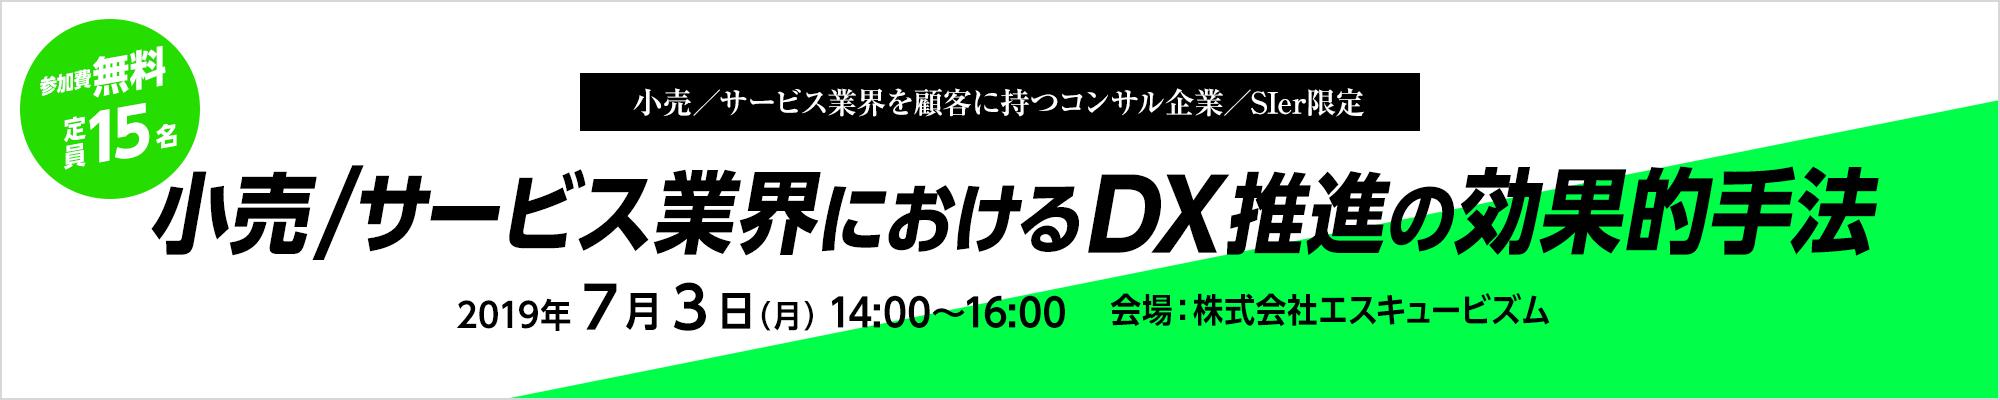 D1538-205-561589-0